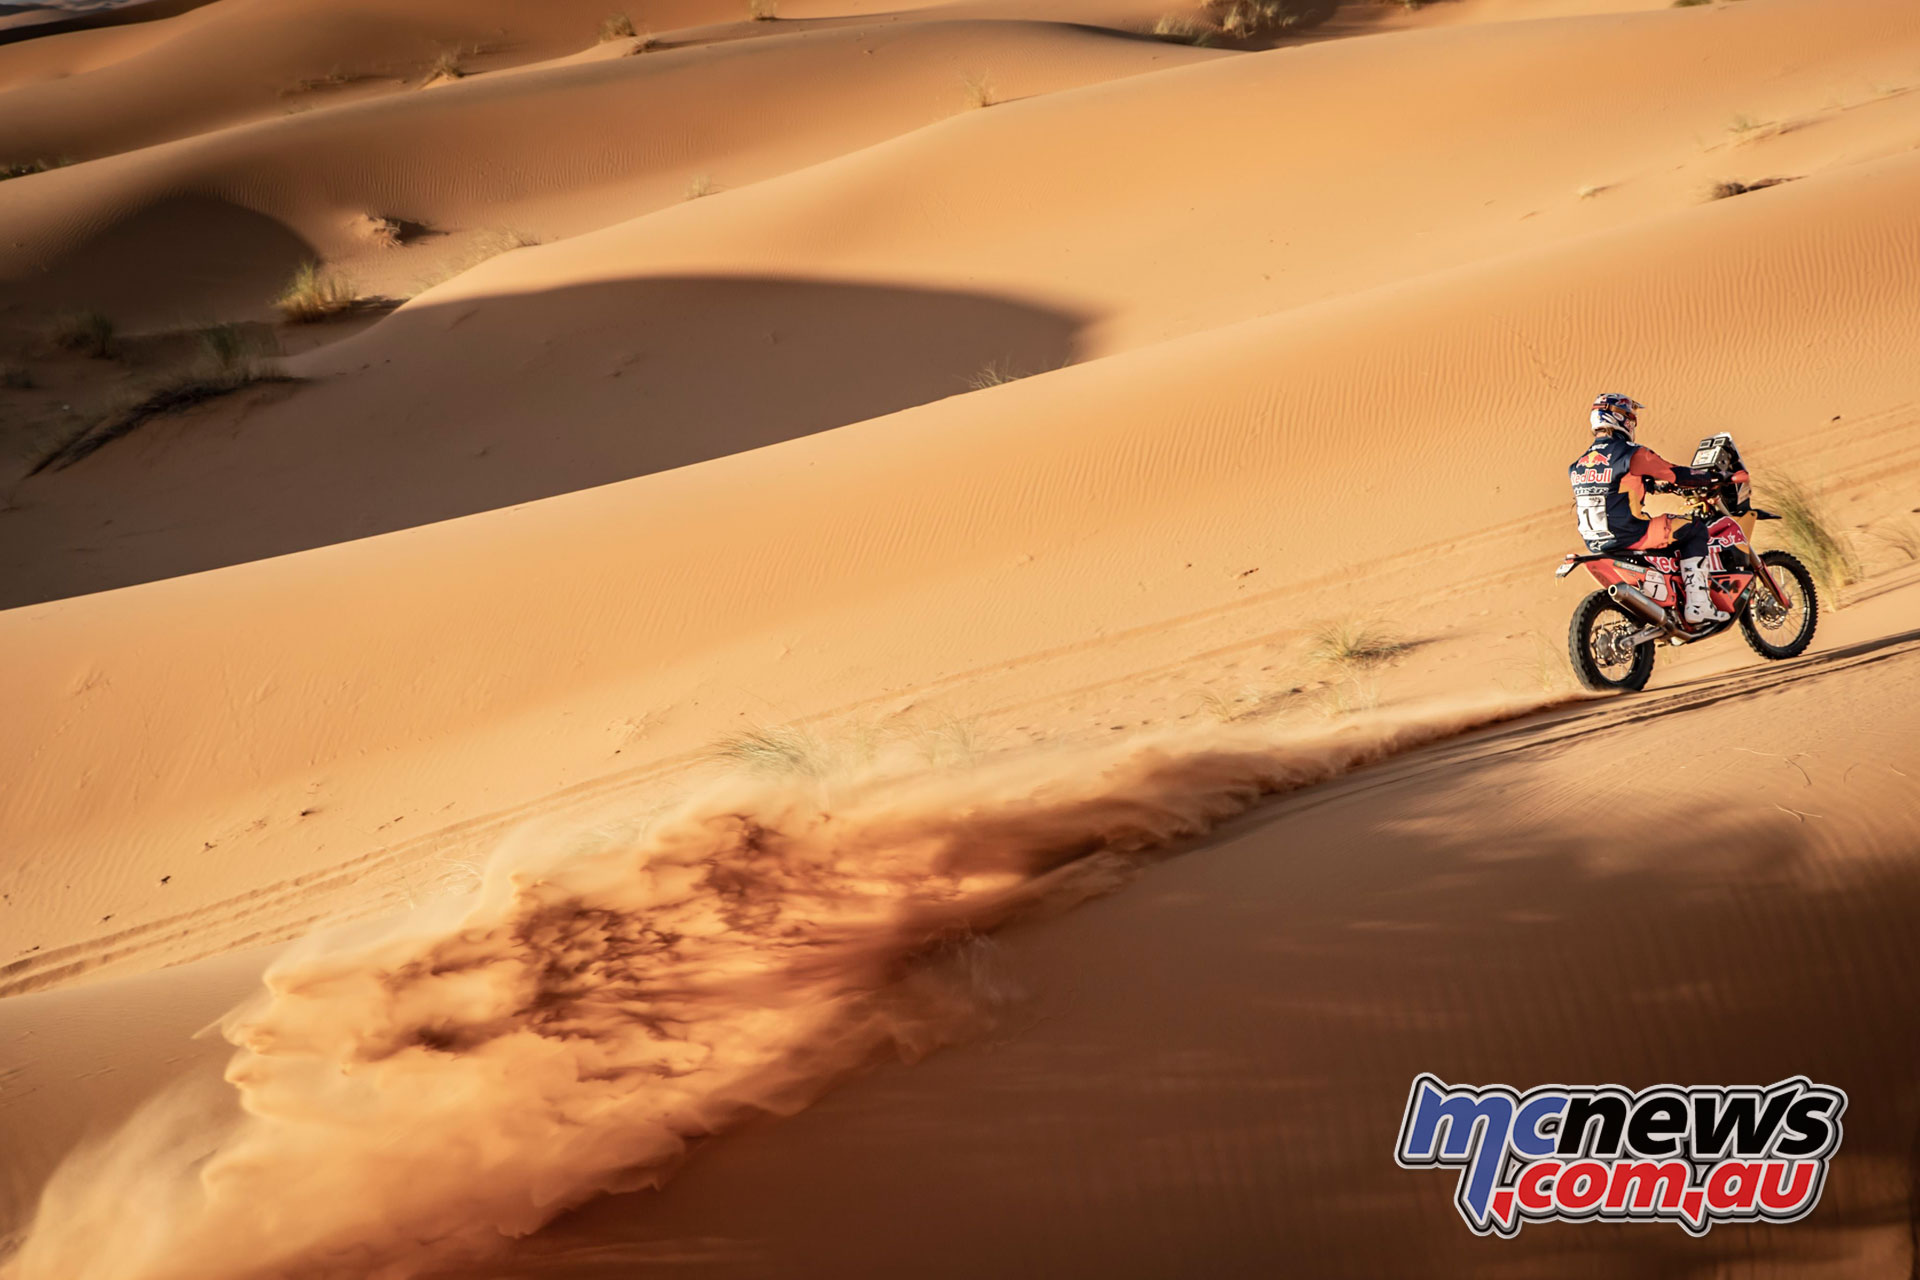 Toby Price KTM RALLY Rally du Maroc